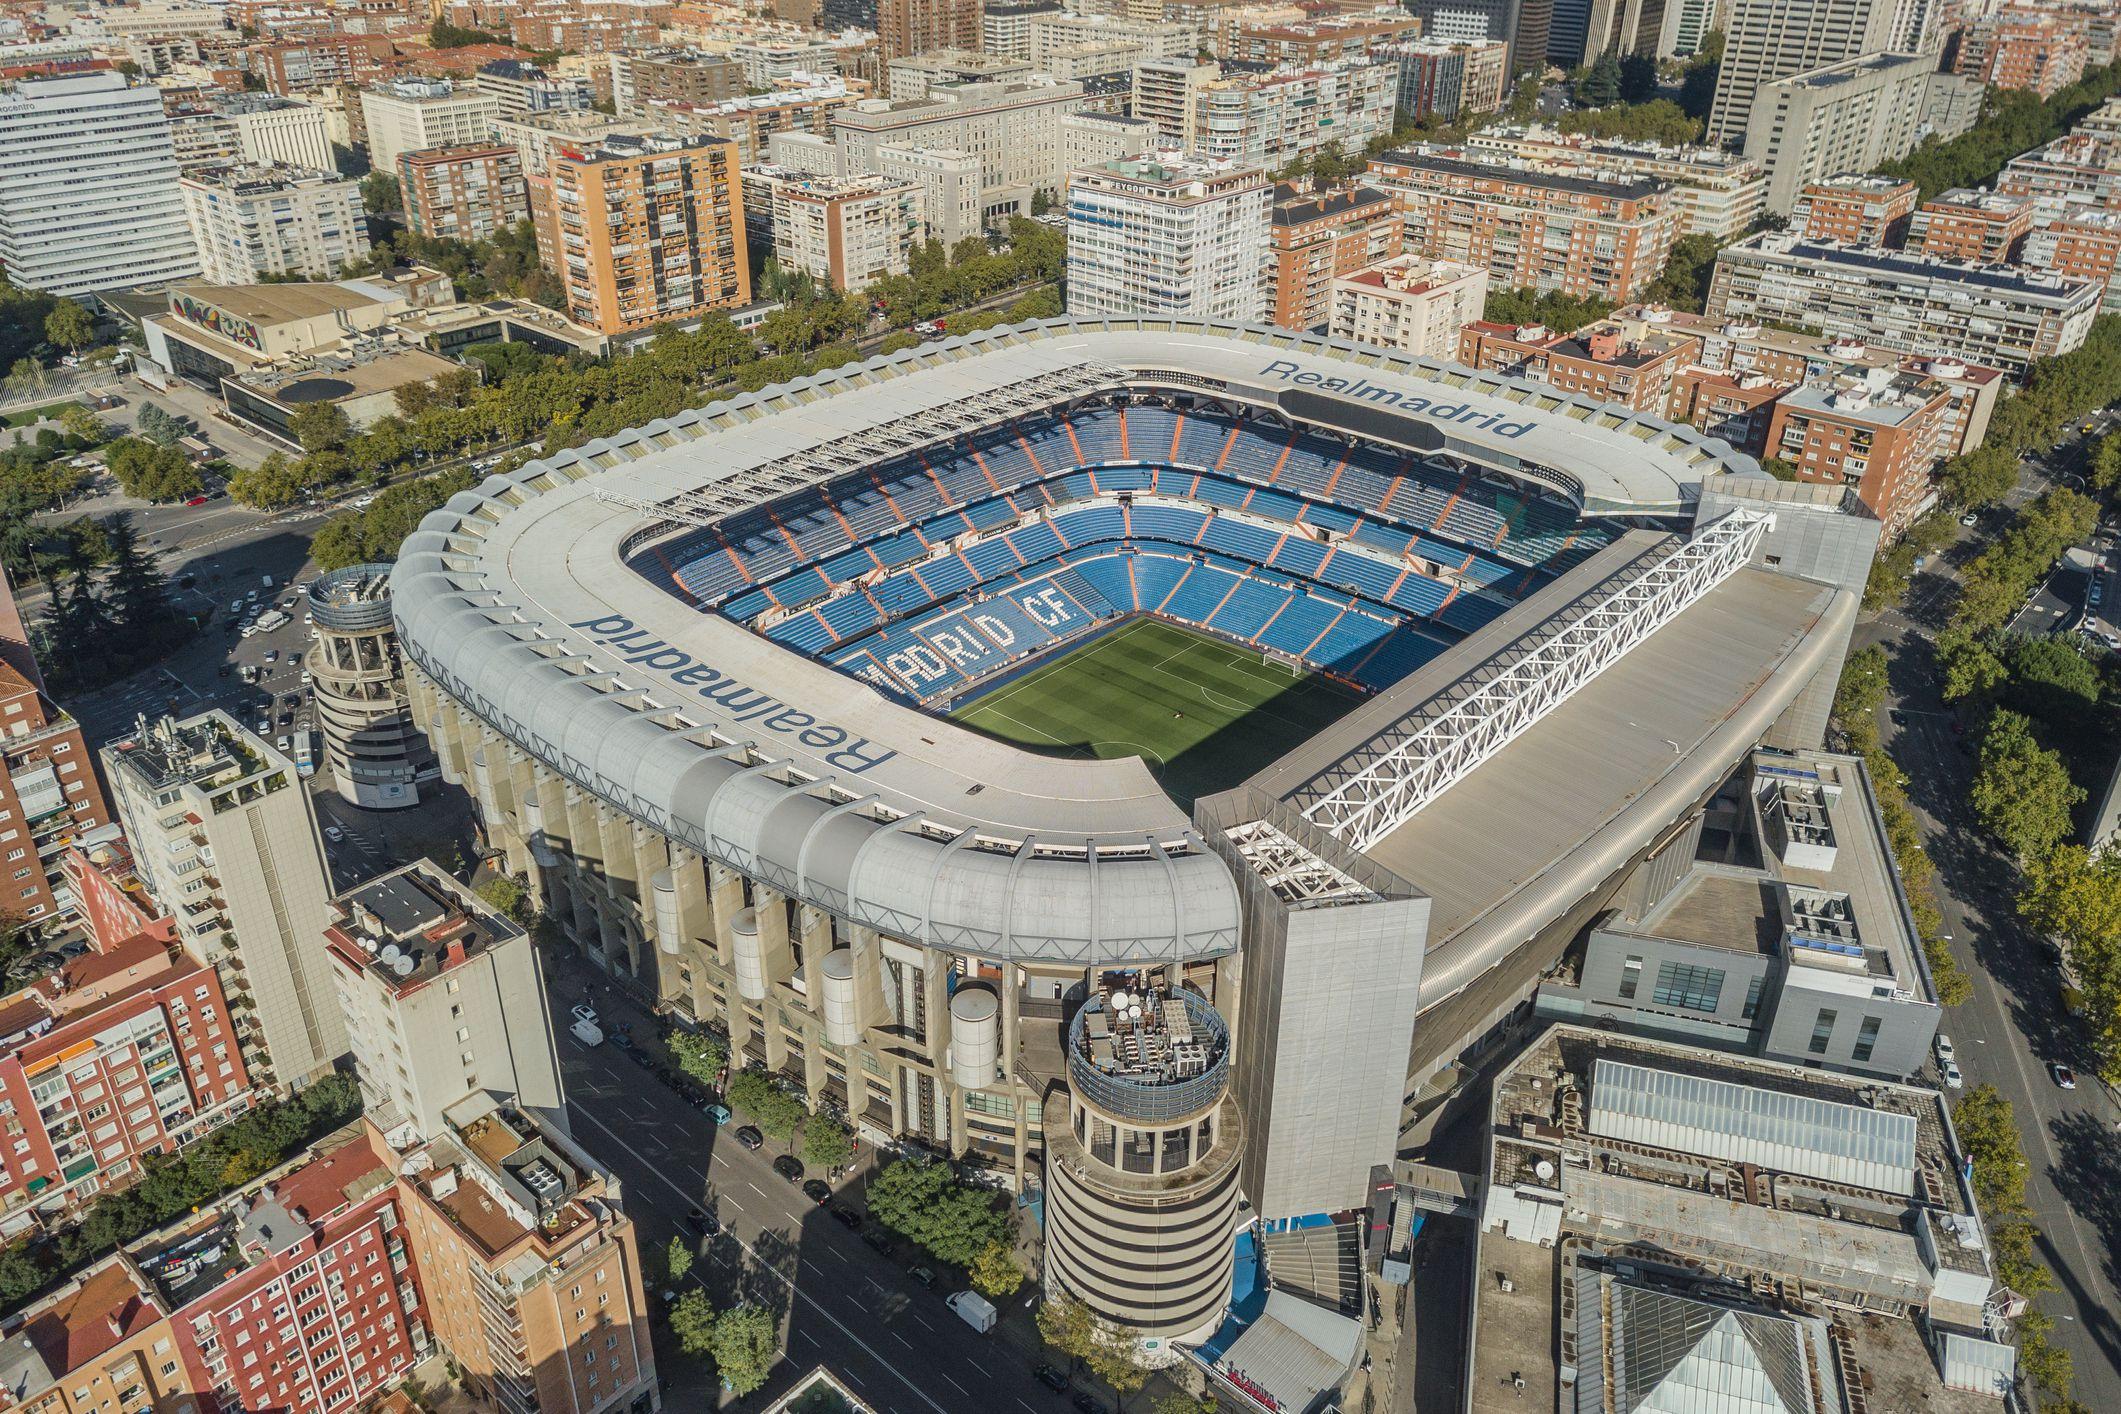 Aerial view of Santiago Bernabeu stadium in Madrid